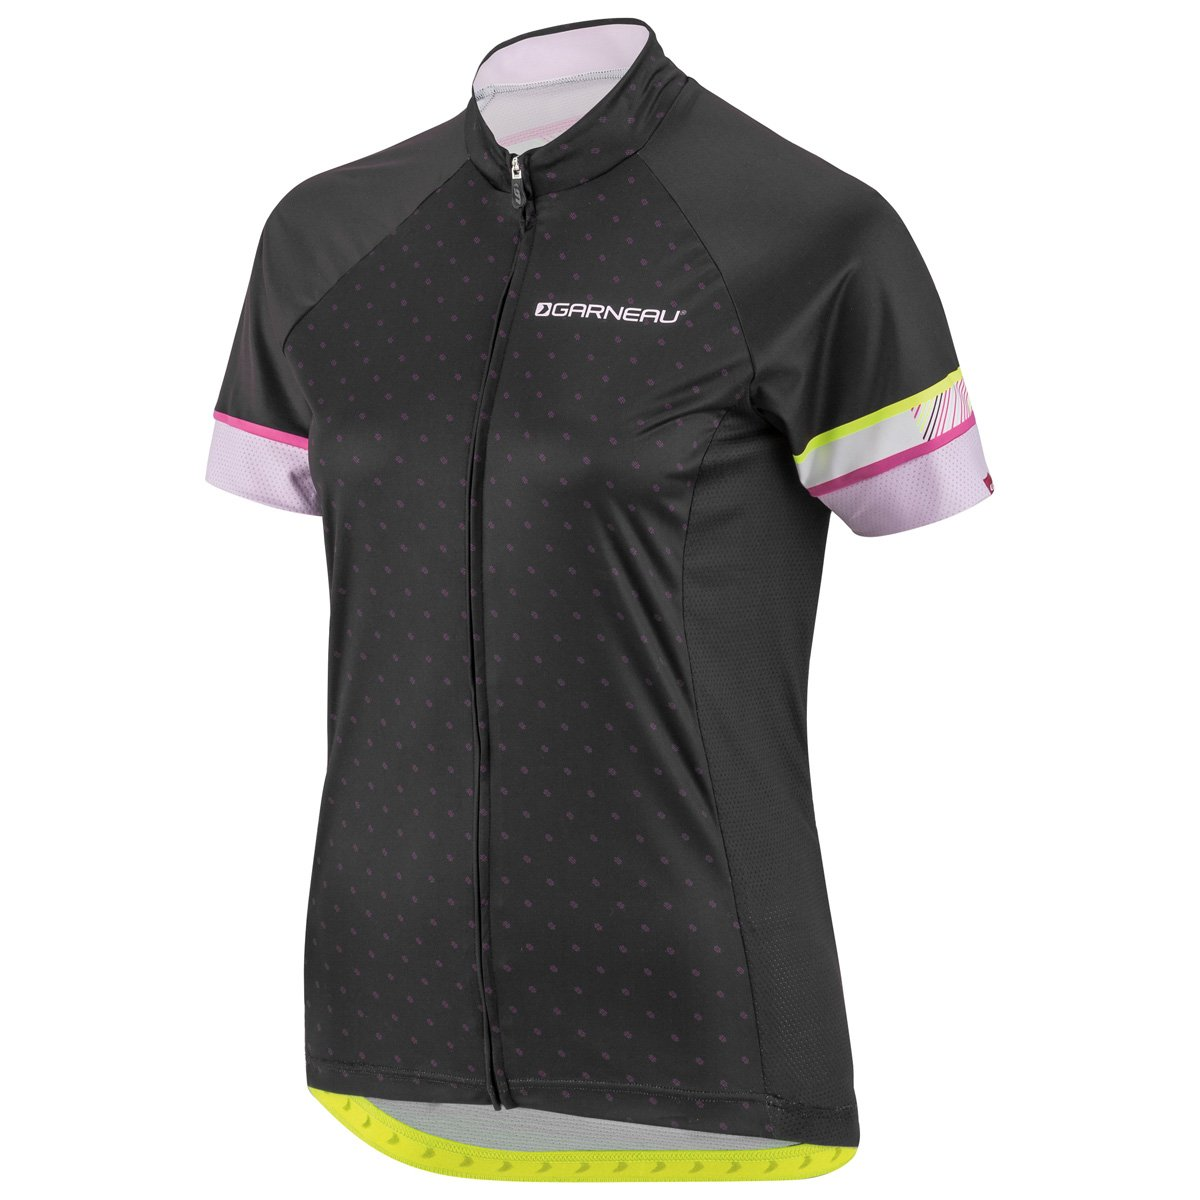 Louis Garneau Womens Equipe Lightweight Ventilated Short Sleeve Cycling Jersey  XS Black  Amazon.co.uk  Sports   Outdoors 4239d82ed